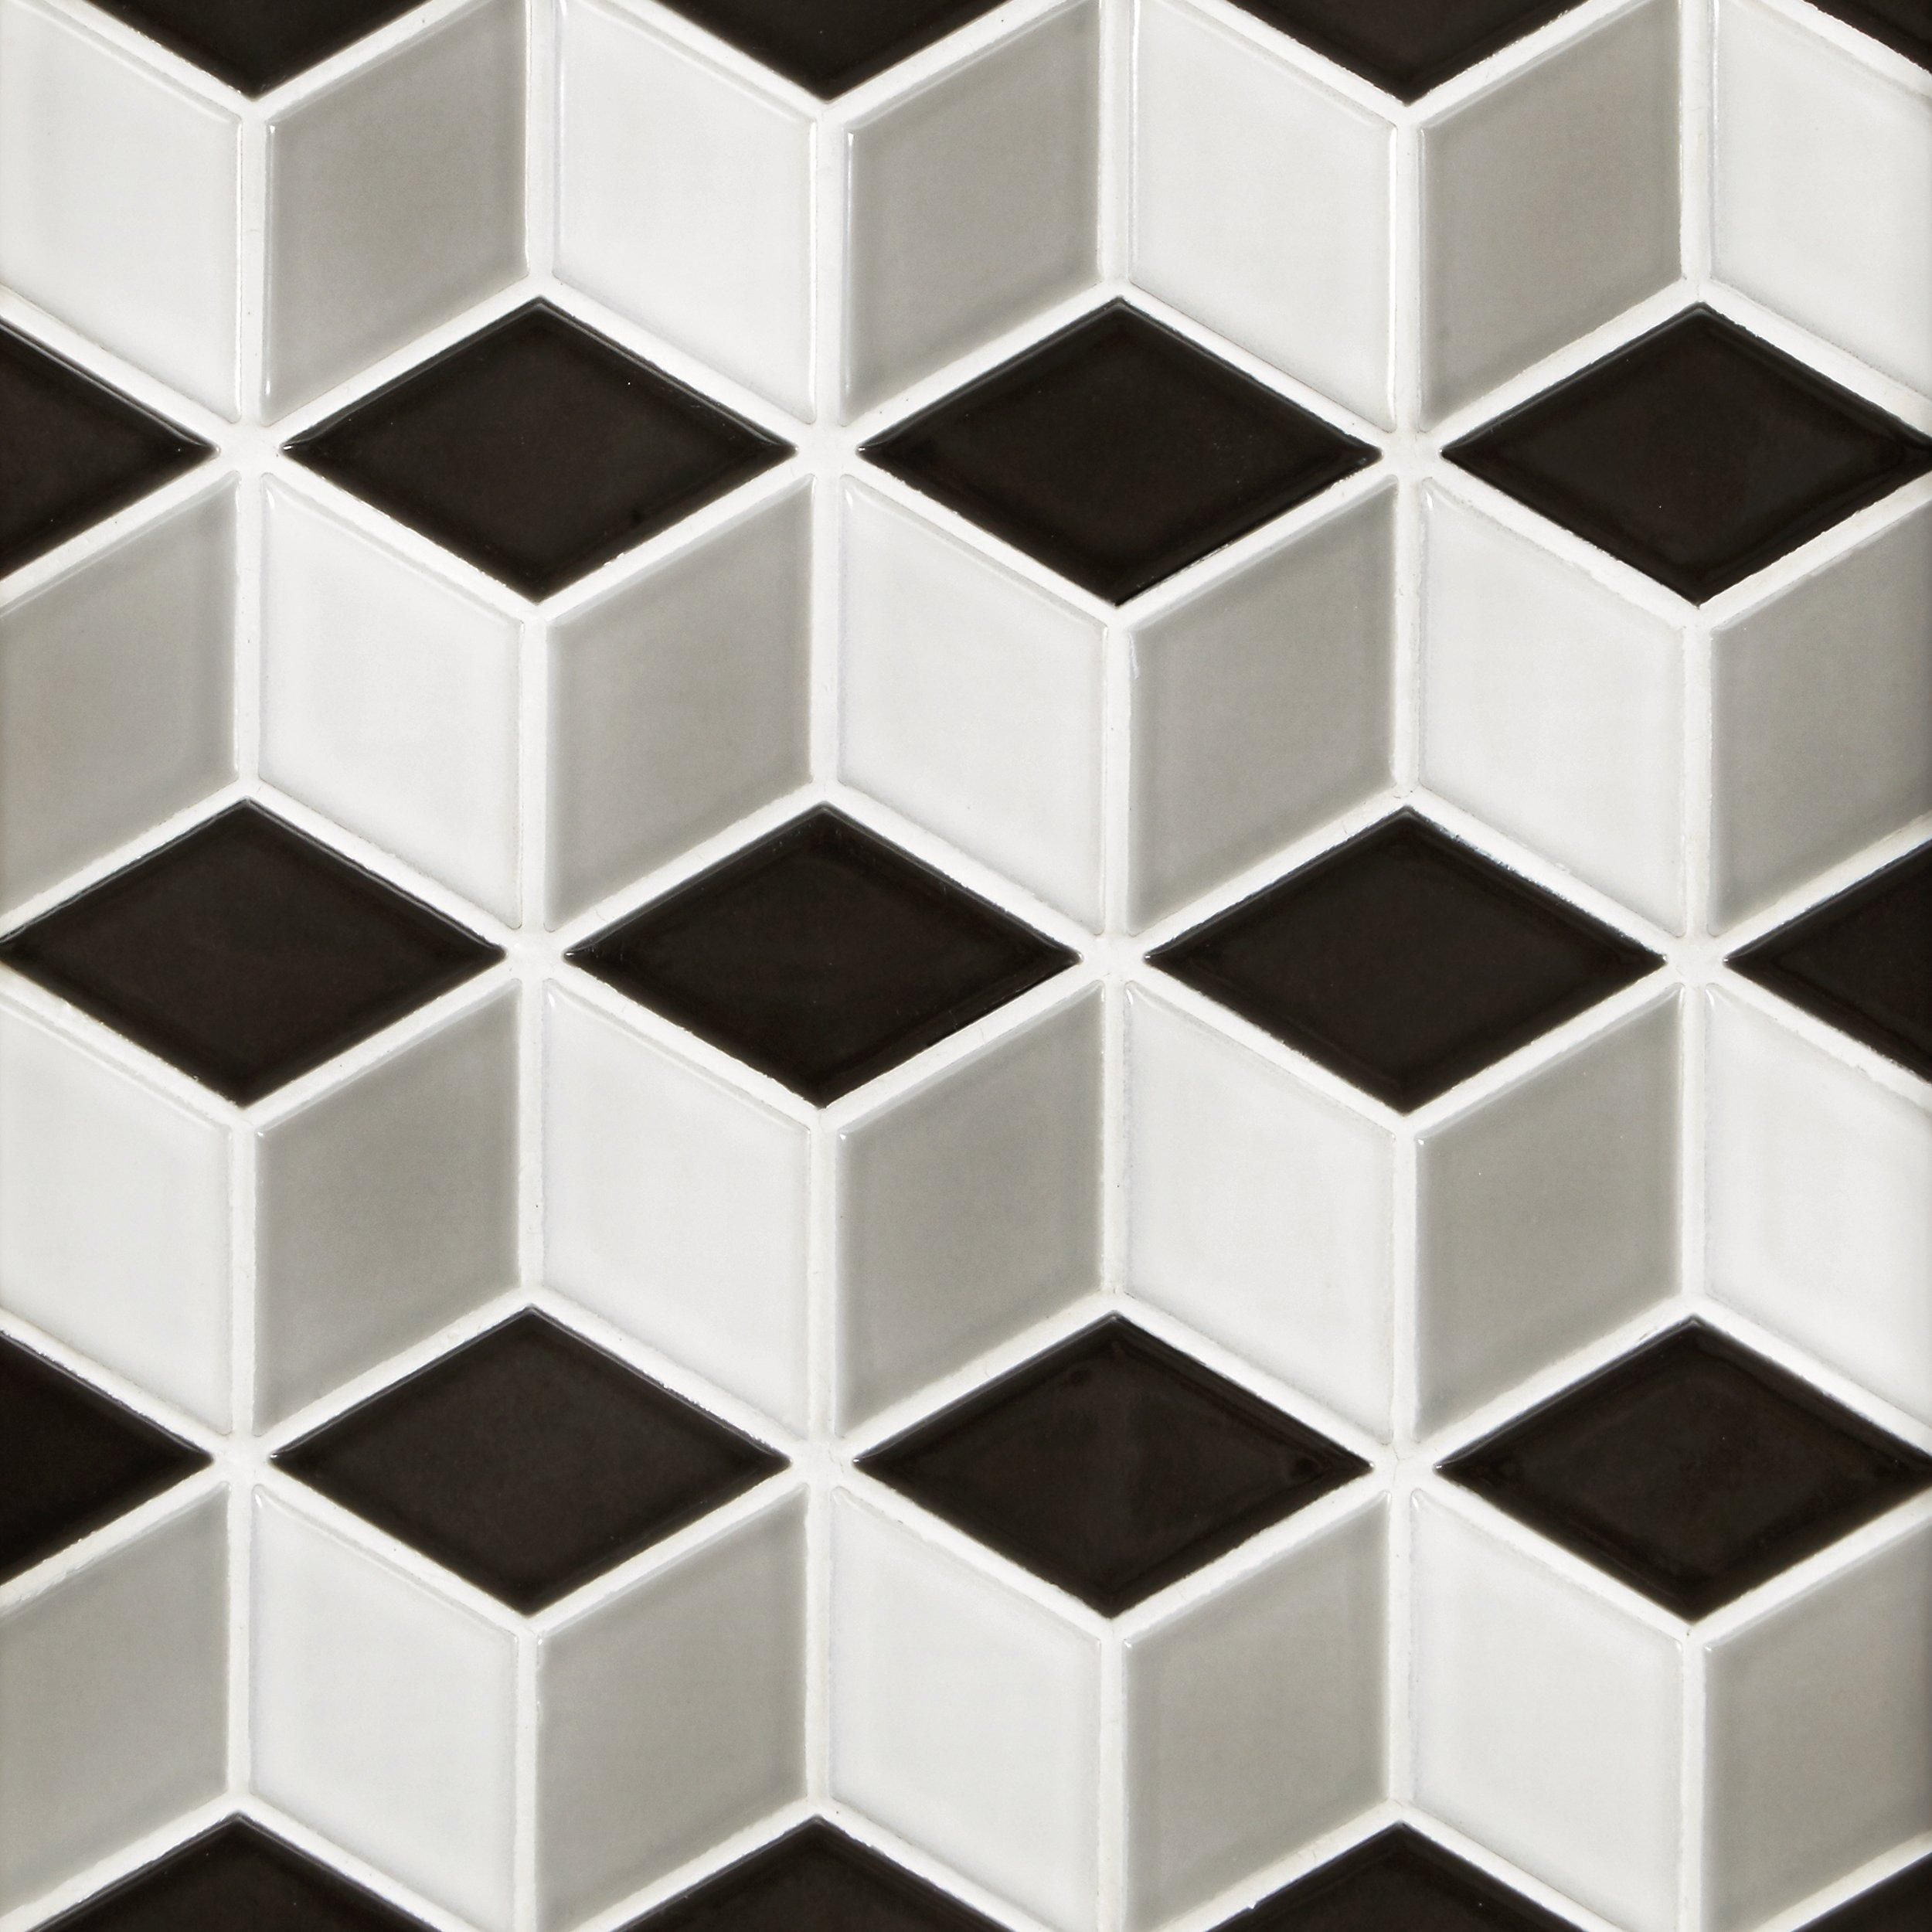 Prism Porcelain Mosaic In 2020 Porcelain Mosaic Mosaic Mosaic Glass